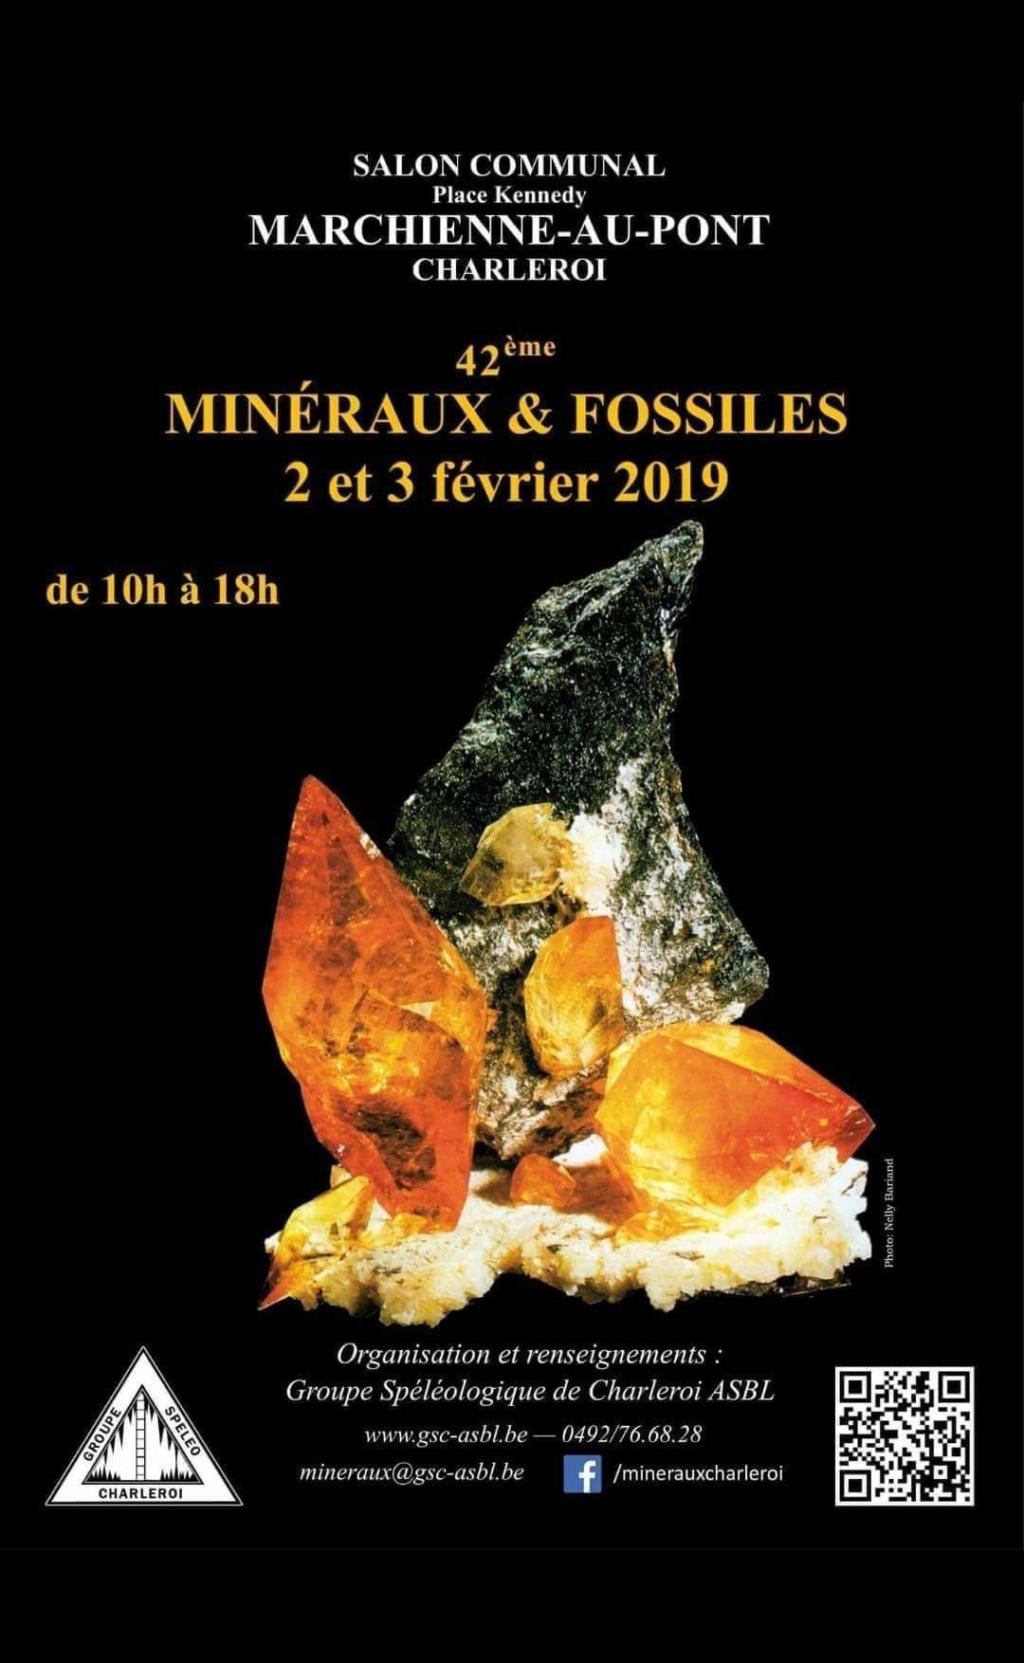 Ferias y eventos de Febrero 2019 Fb_im203